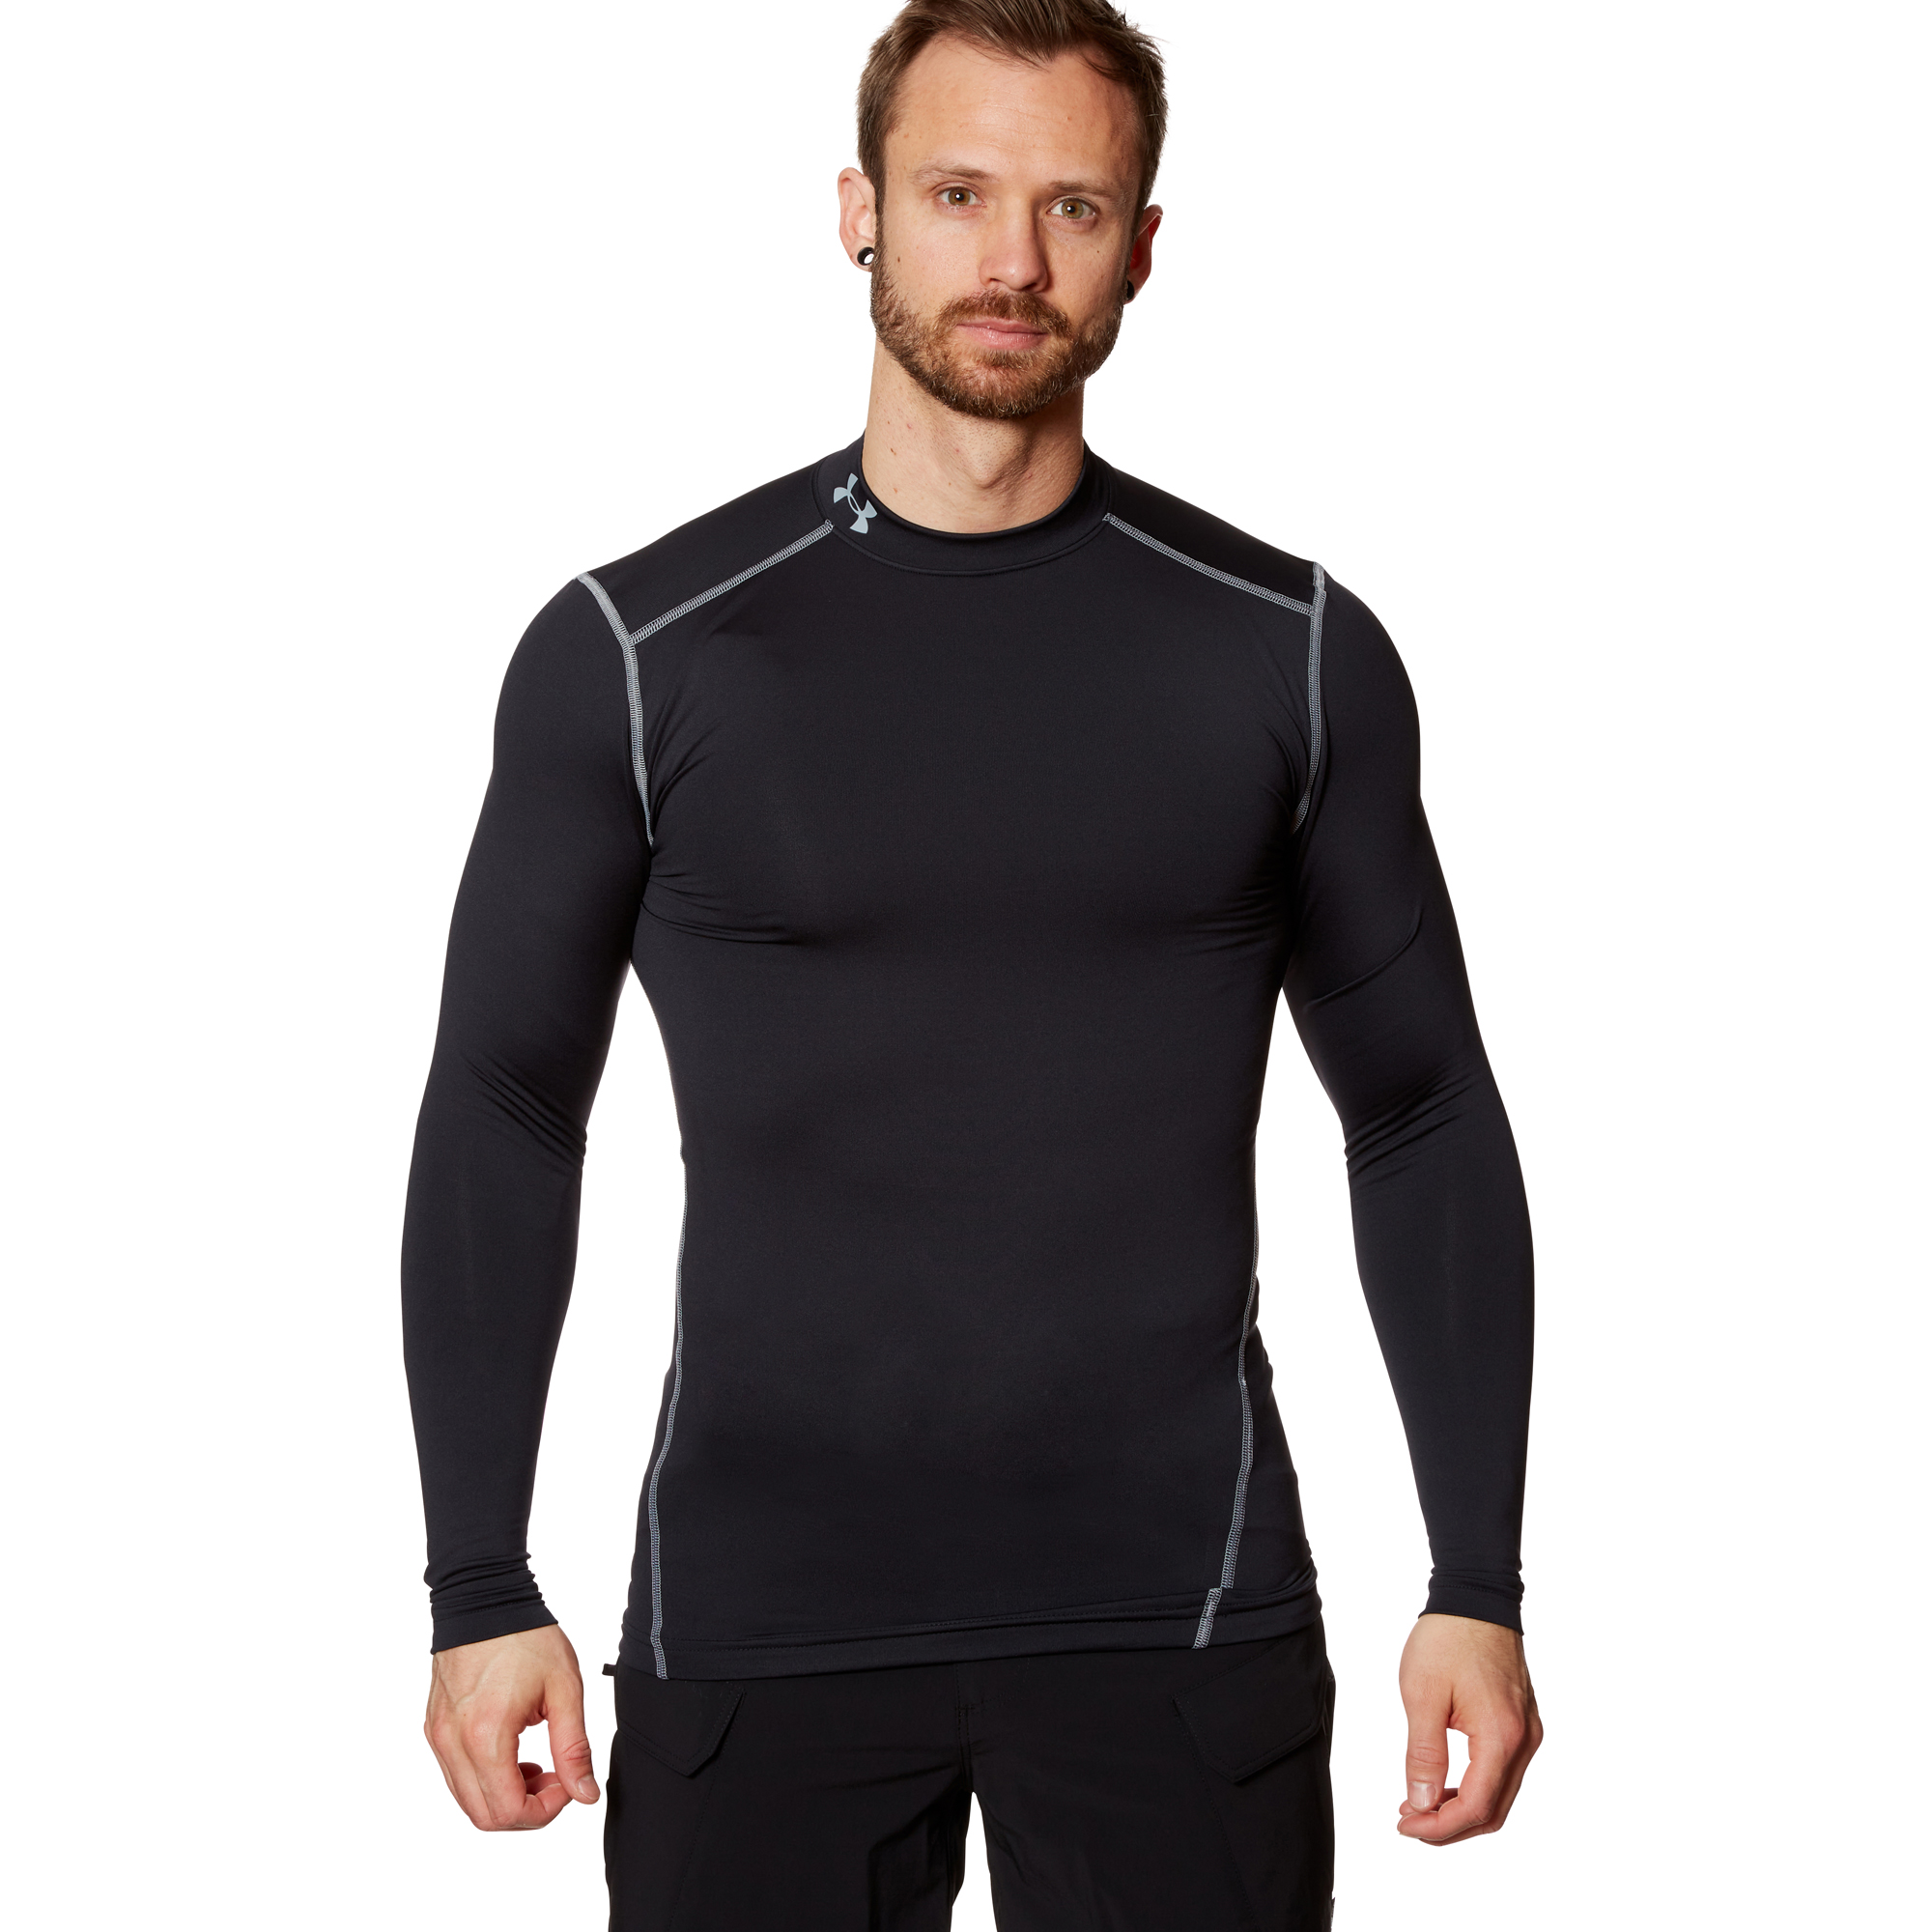 Under Armour ColdGear Compression Mock Shirt black